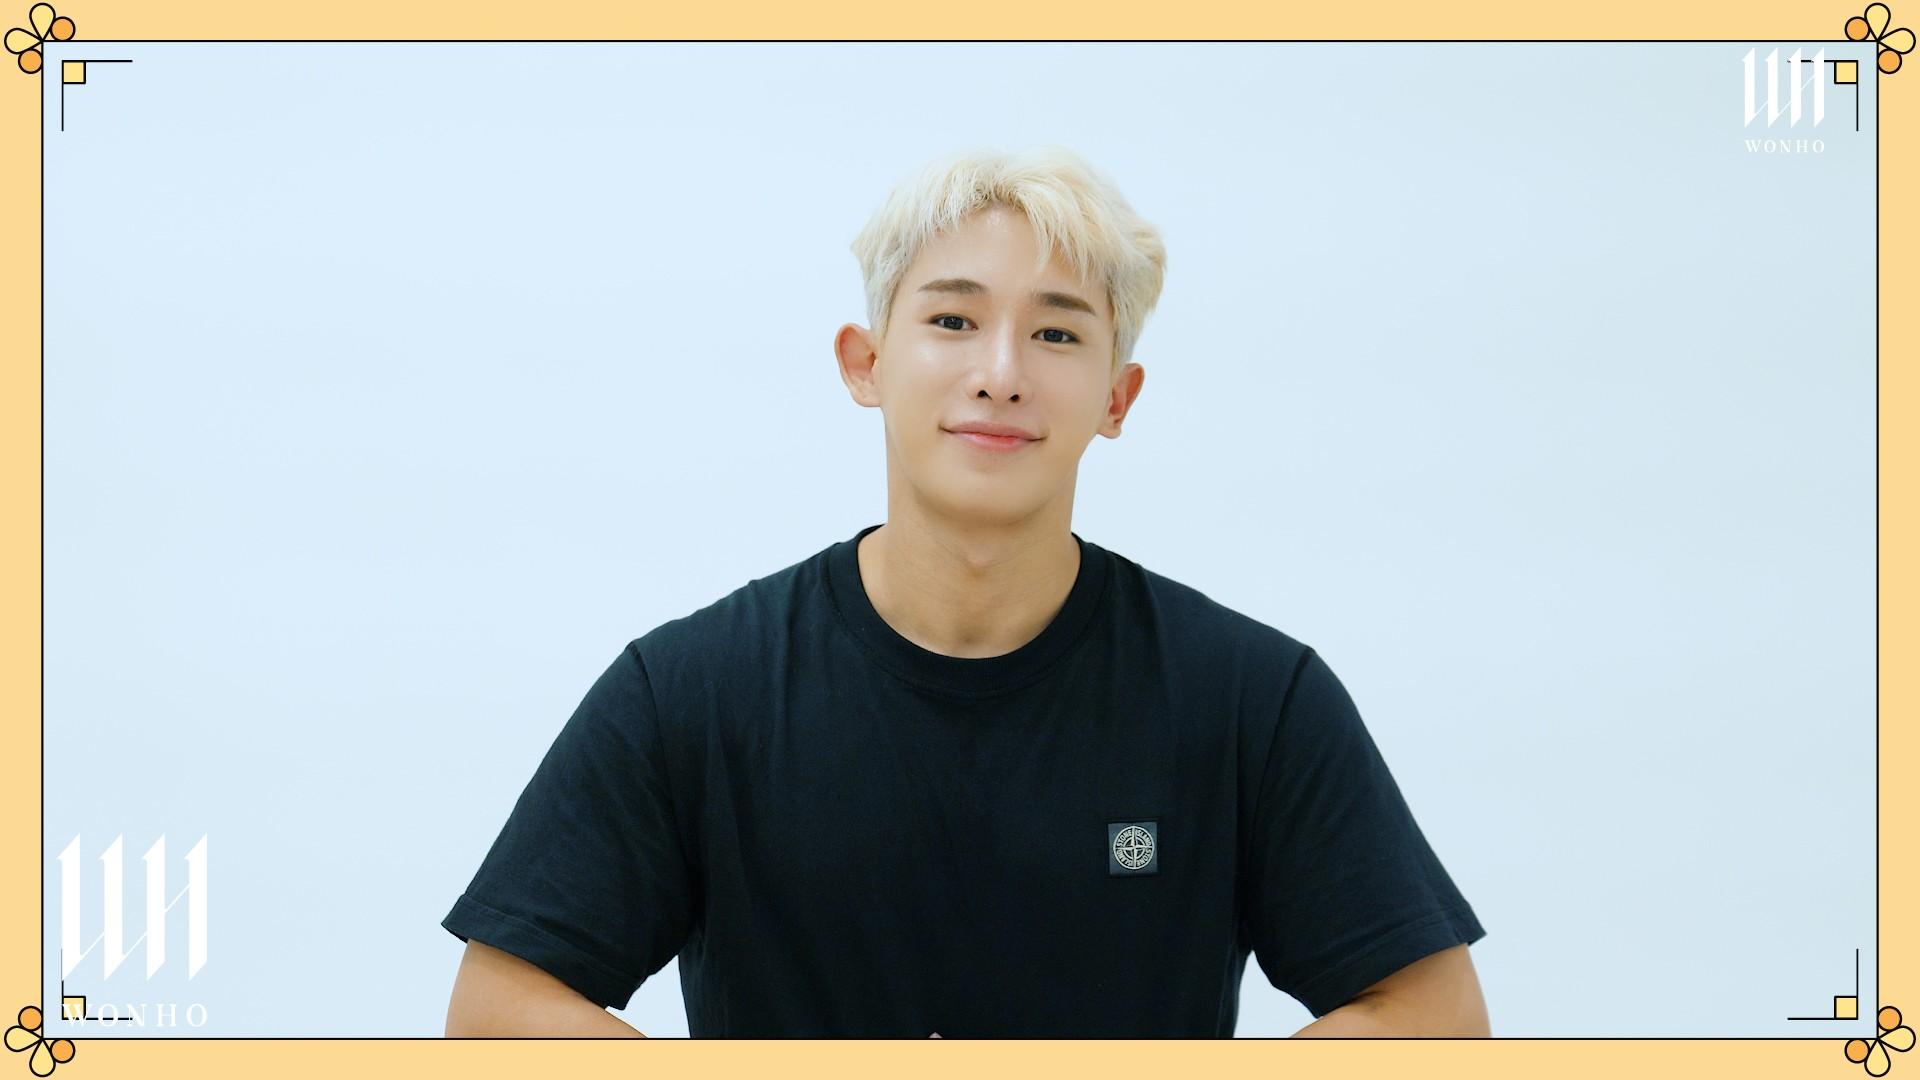 [Special Clip] 원호 (WONHO) - 2021 추석 인사 (2021 Chuseok Greeting)